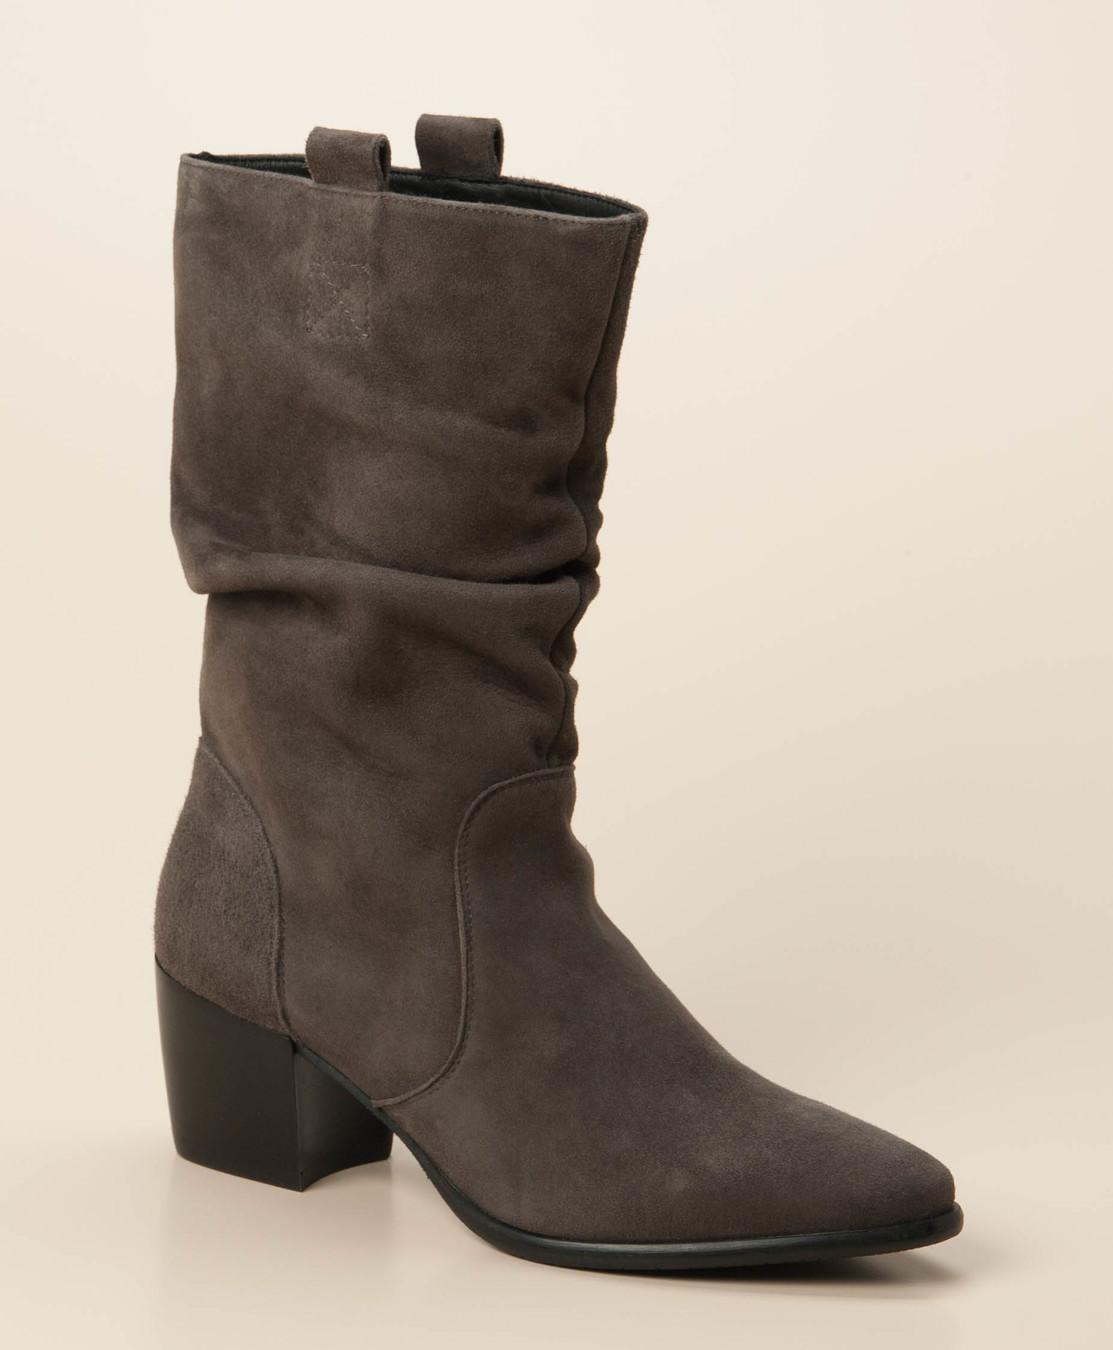 DONNA CAROLINA DAMEN Stiefel Stiefelette Boots Gr. 38,5 Nr